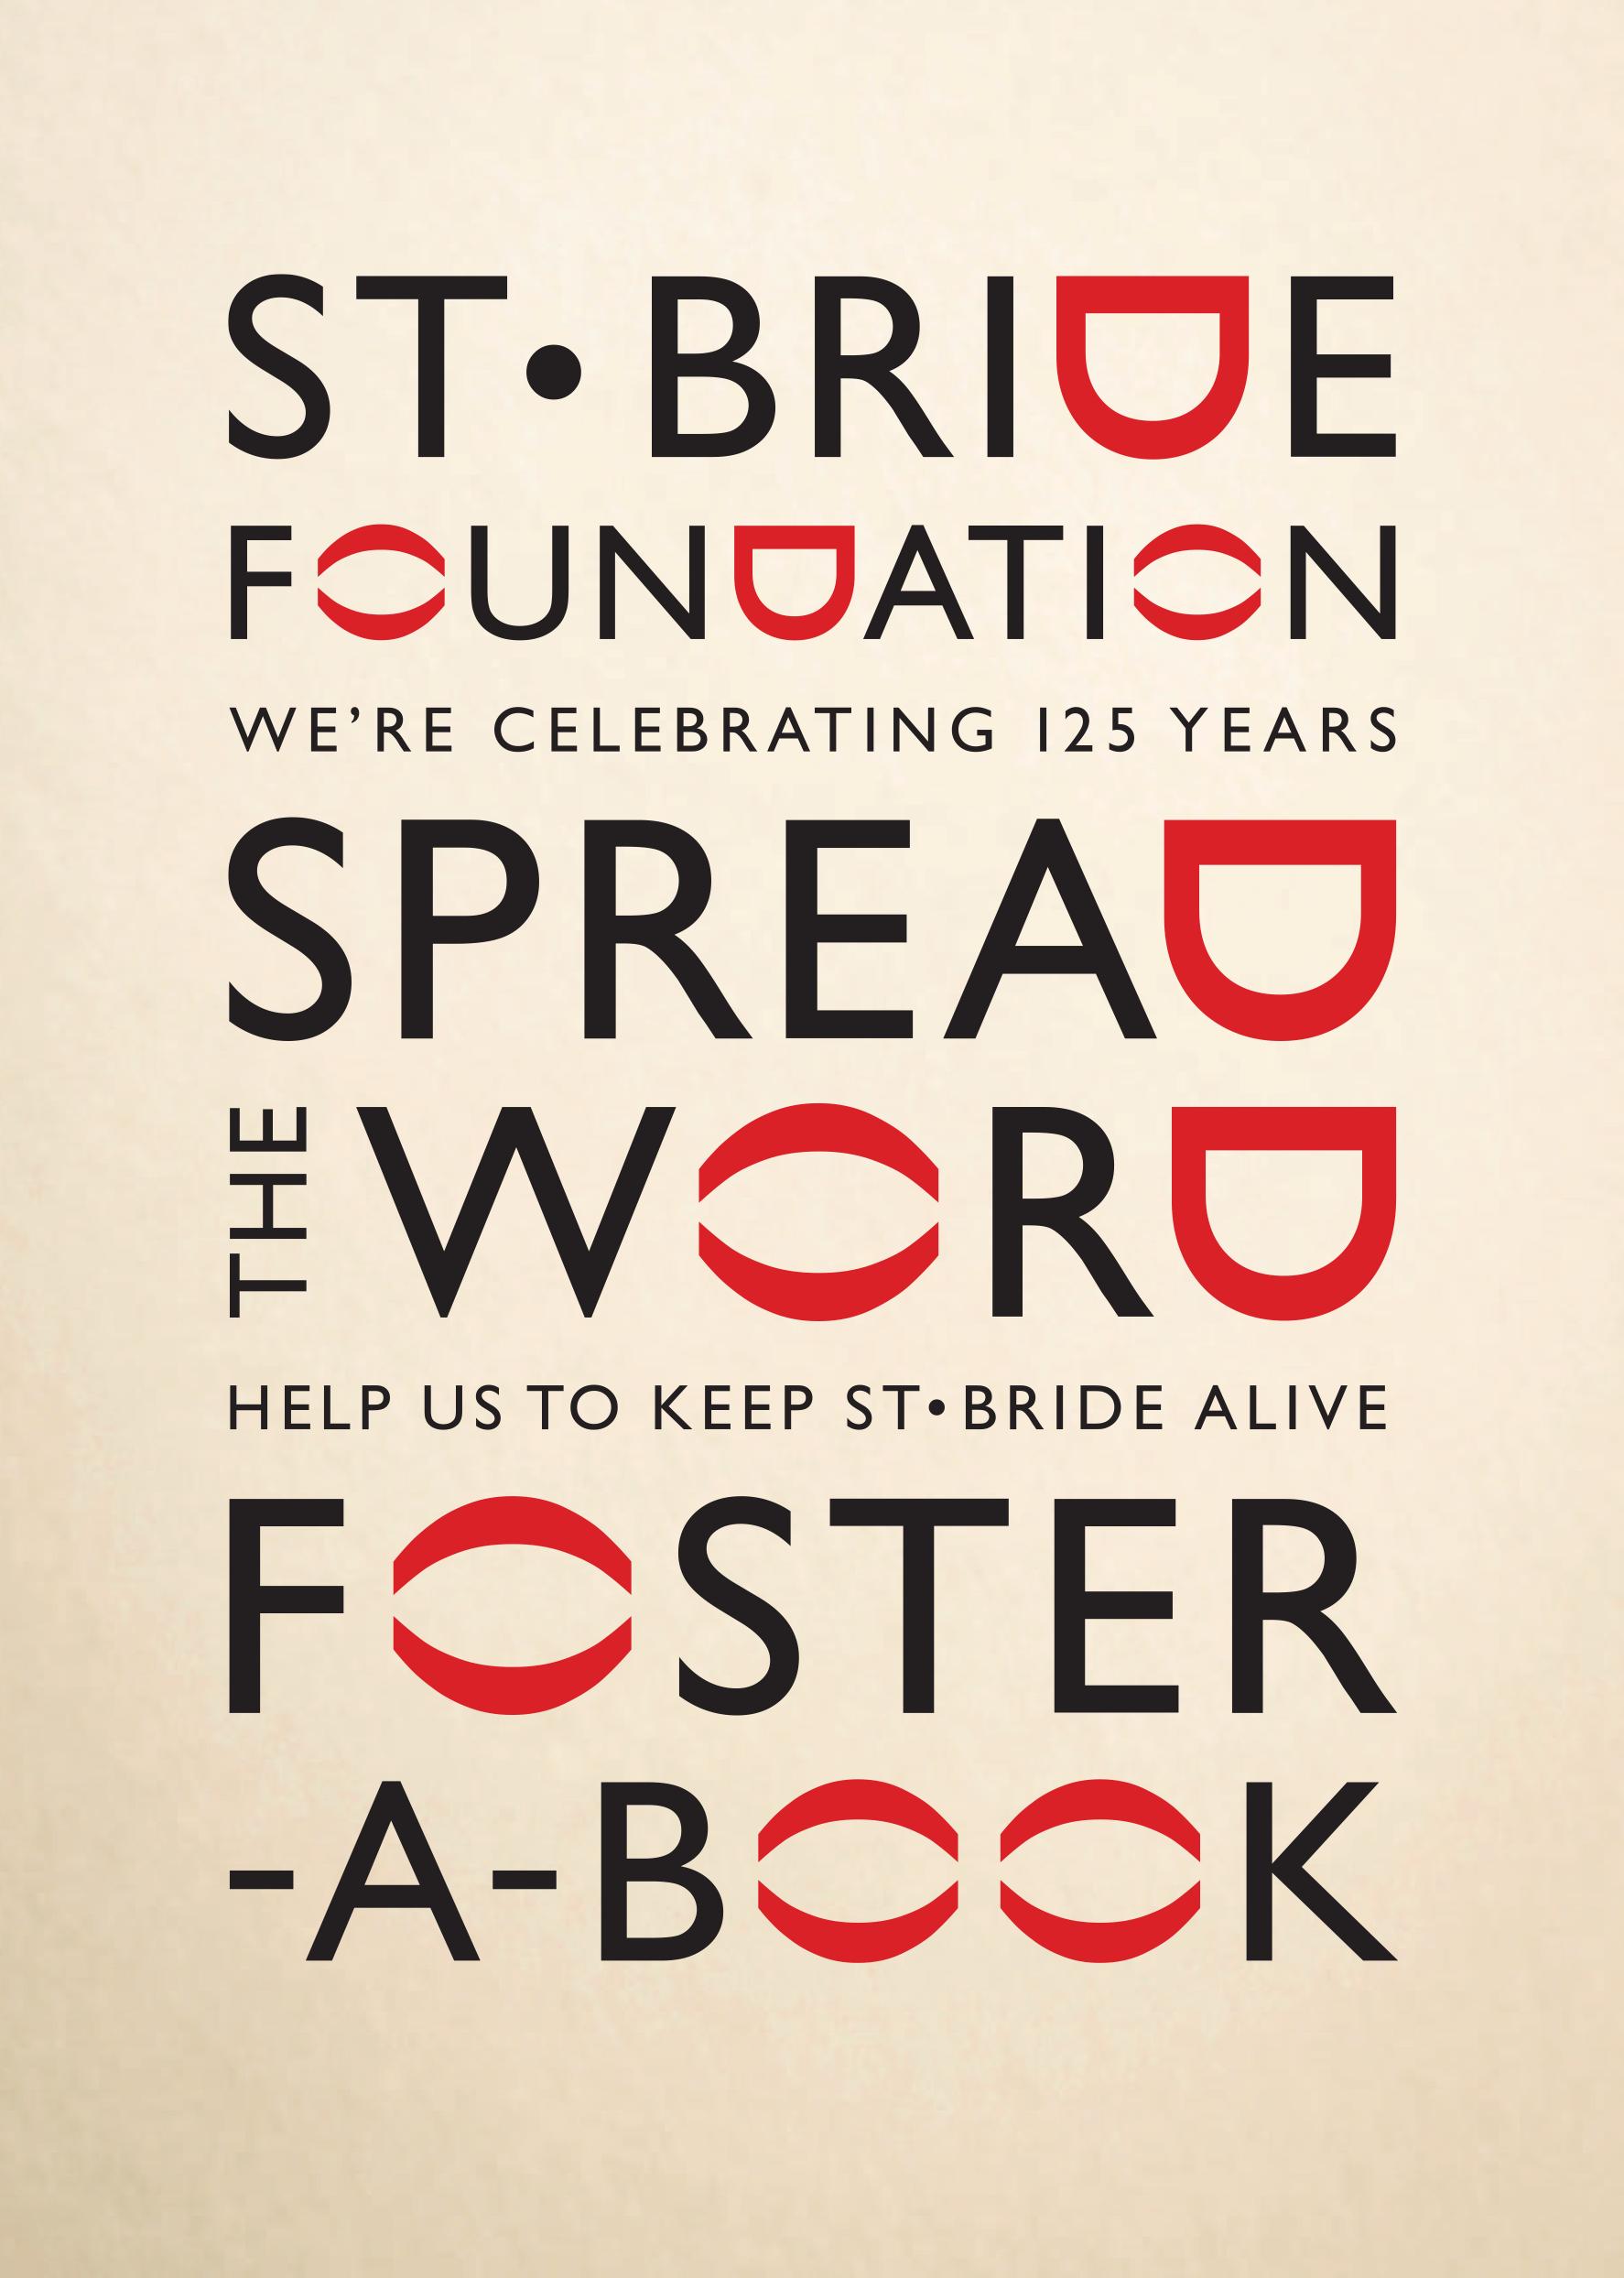 St Bride Foundation Poster 1